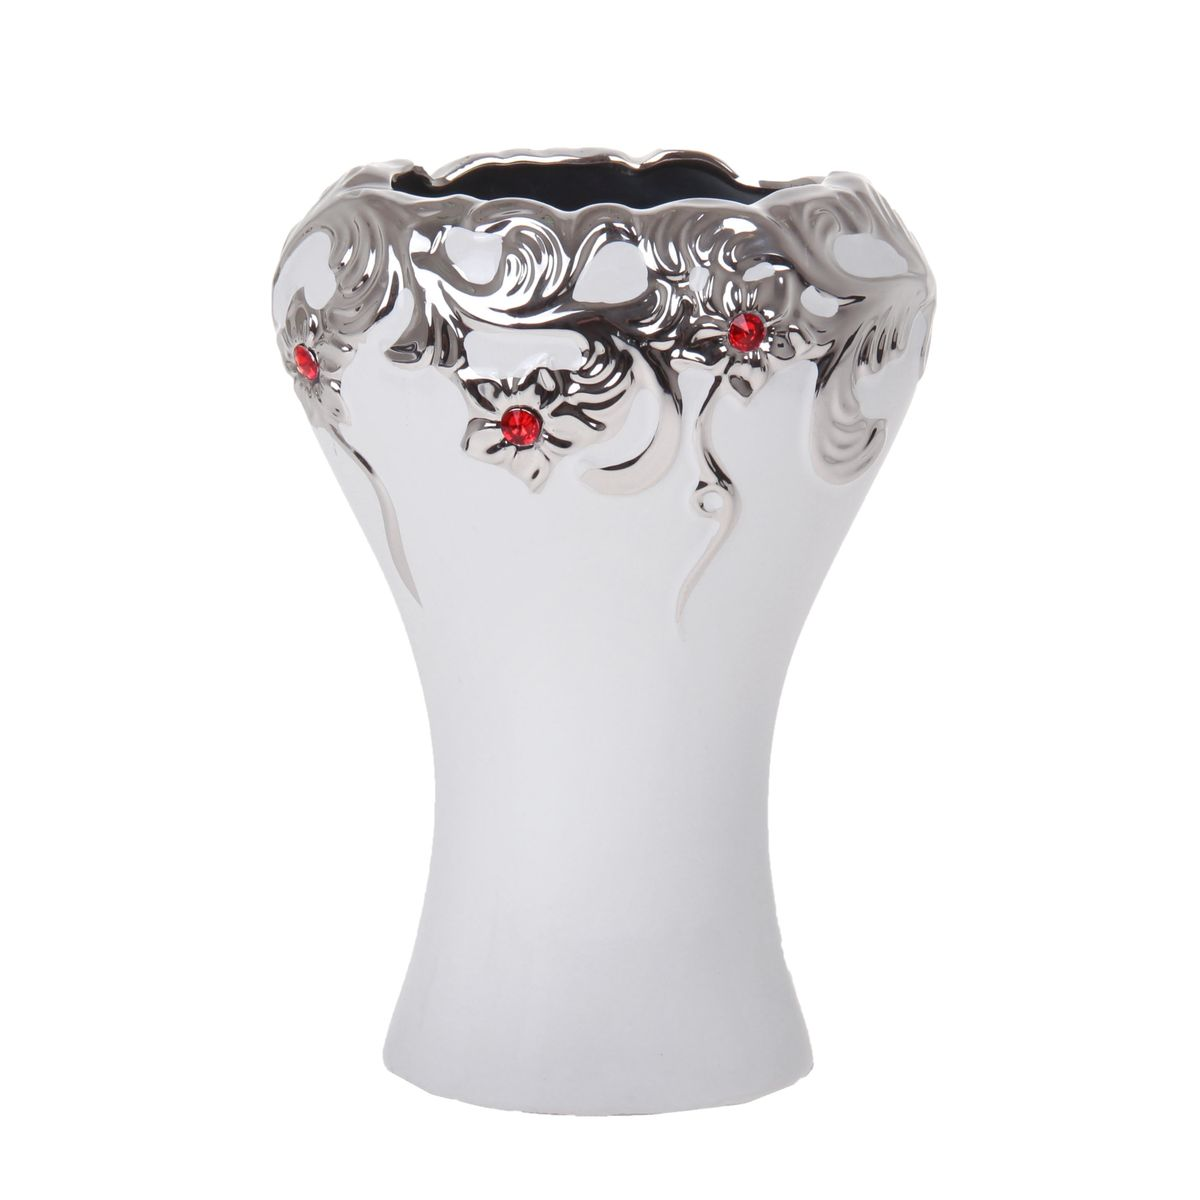 Ваза керамика изумрудная капля 24*17*11 см 865954FS-91909Керамика